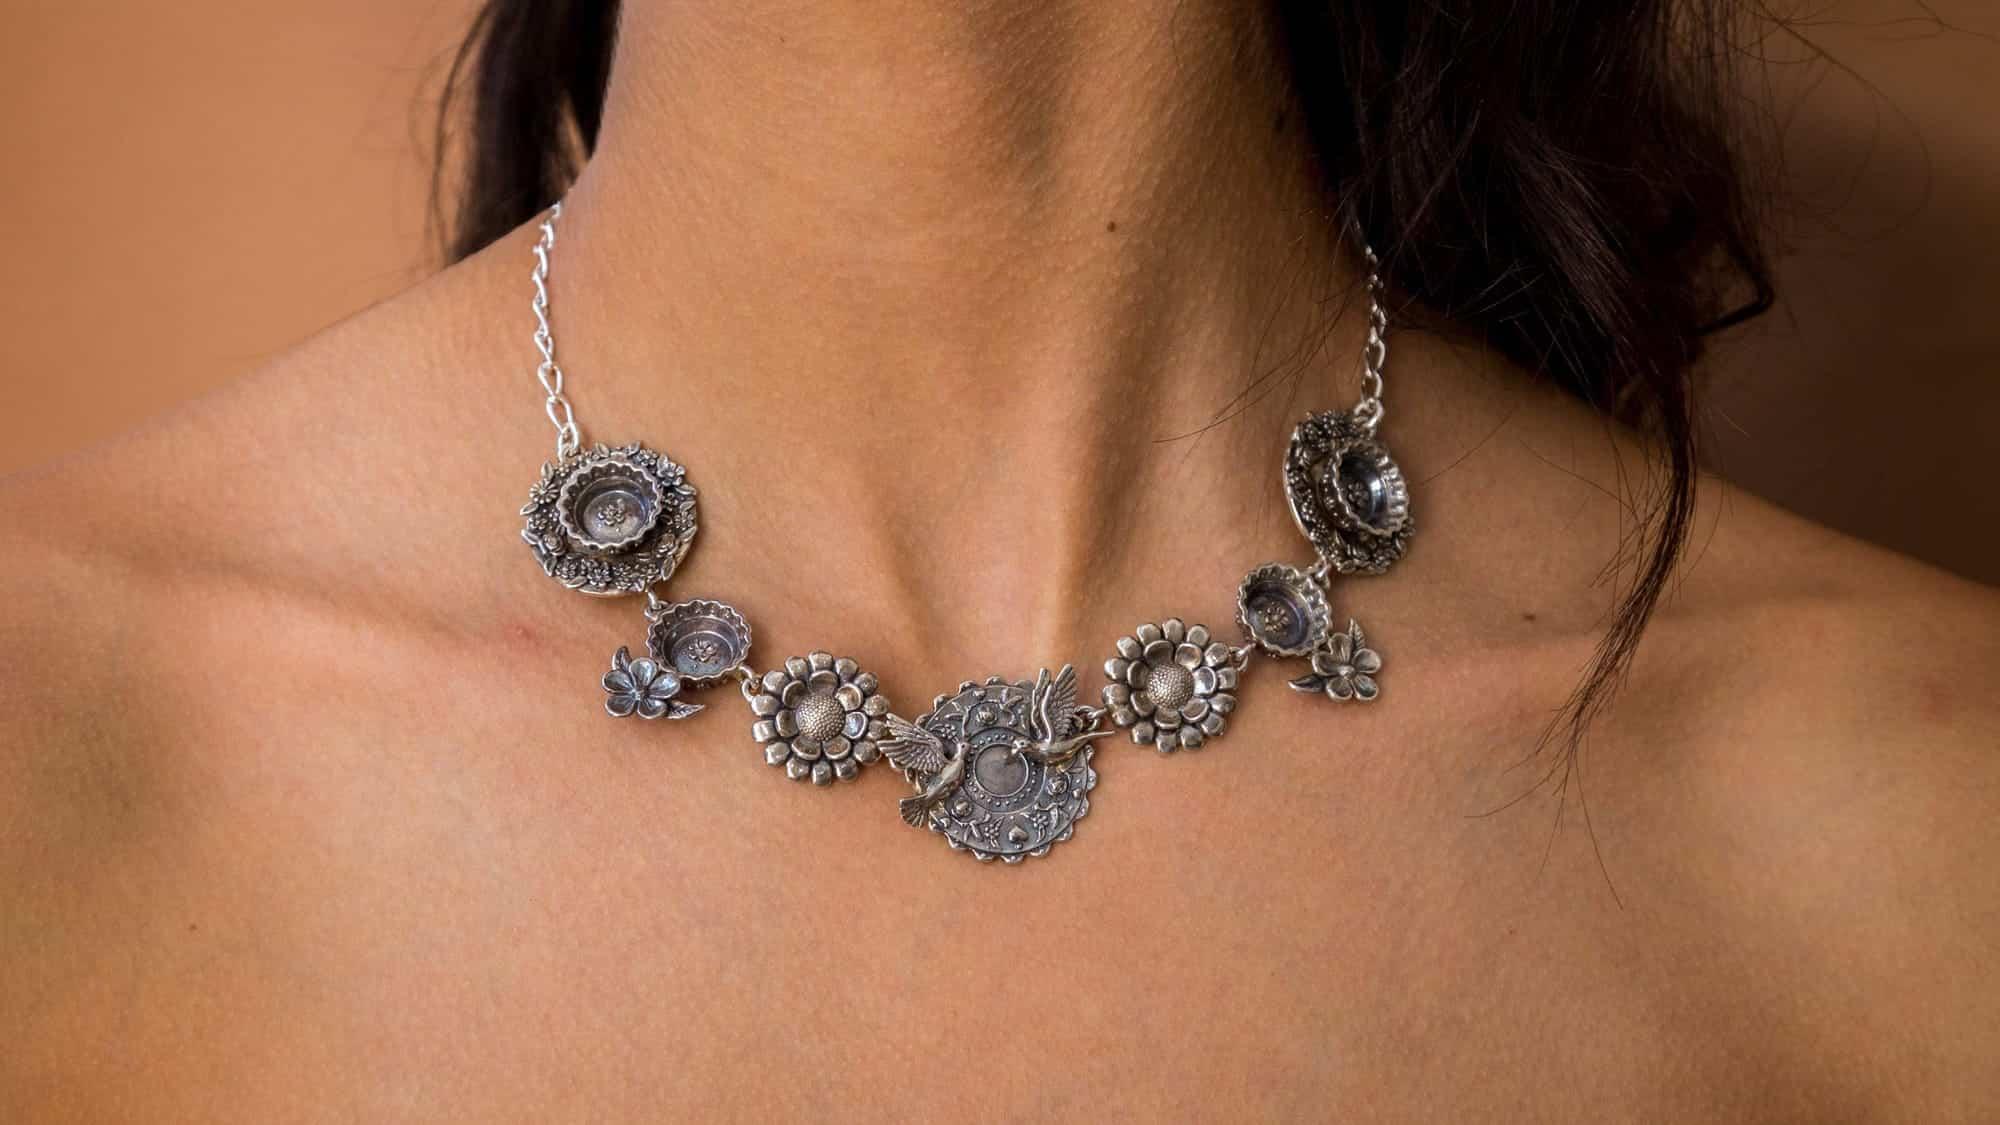 joyas mexicanas gabriela sanchez gargantilla platos collar gabriela sanchez 28455526957111